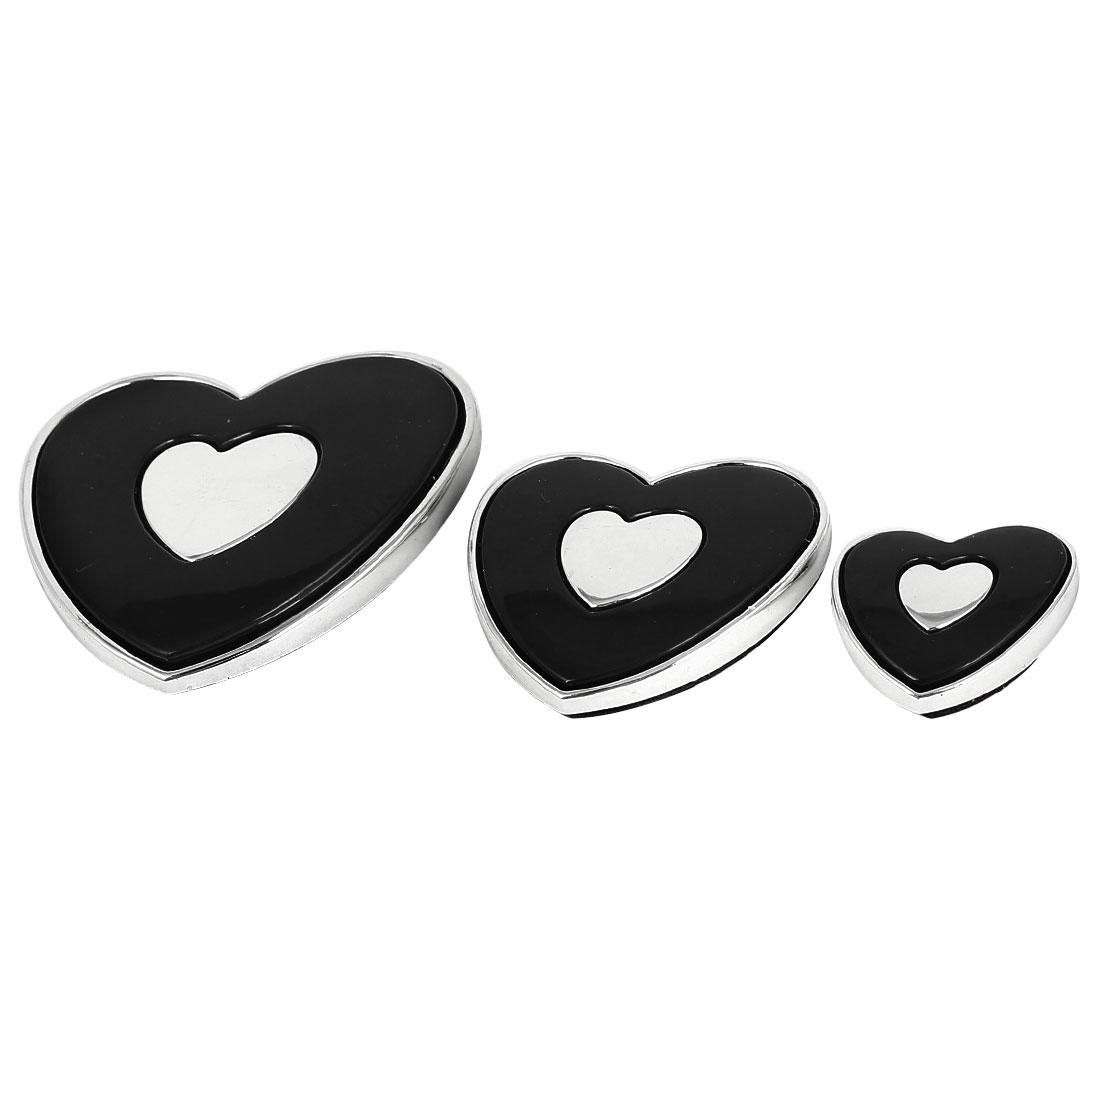 Car Silver Tone Black Plastic Heart Design Sticker Decal Decor 2 Sets